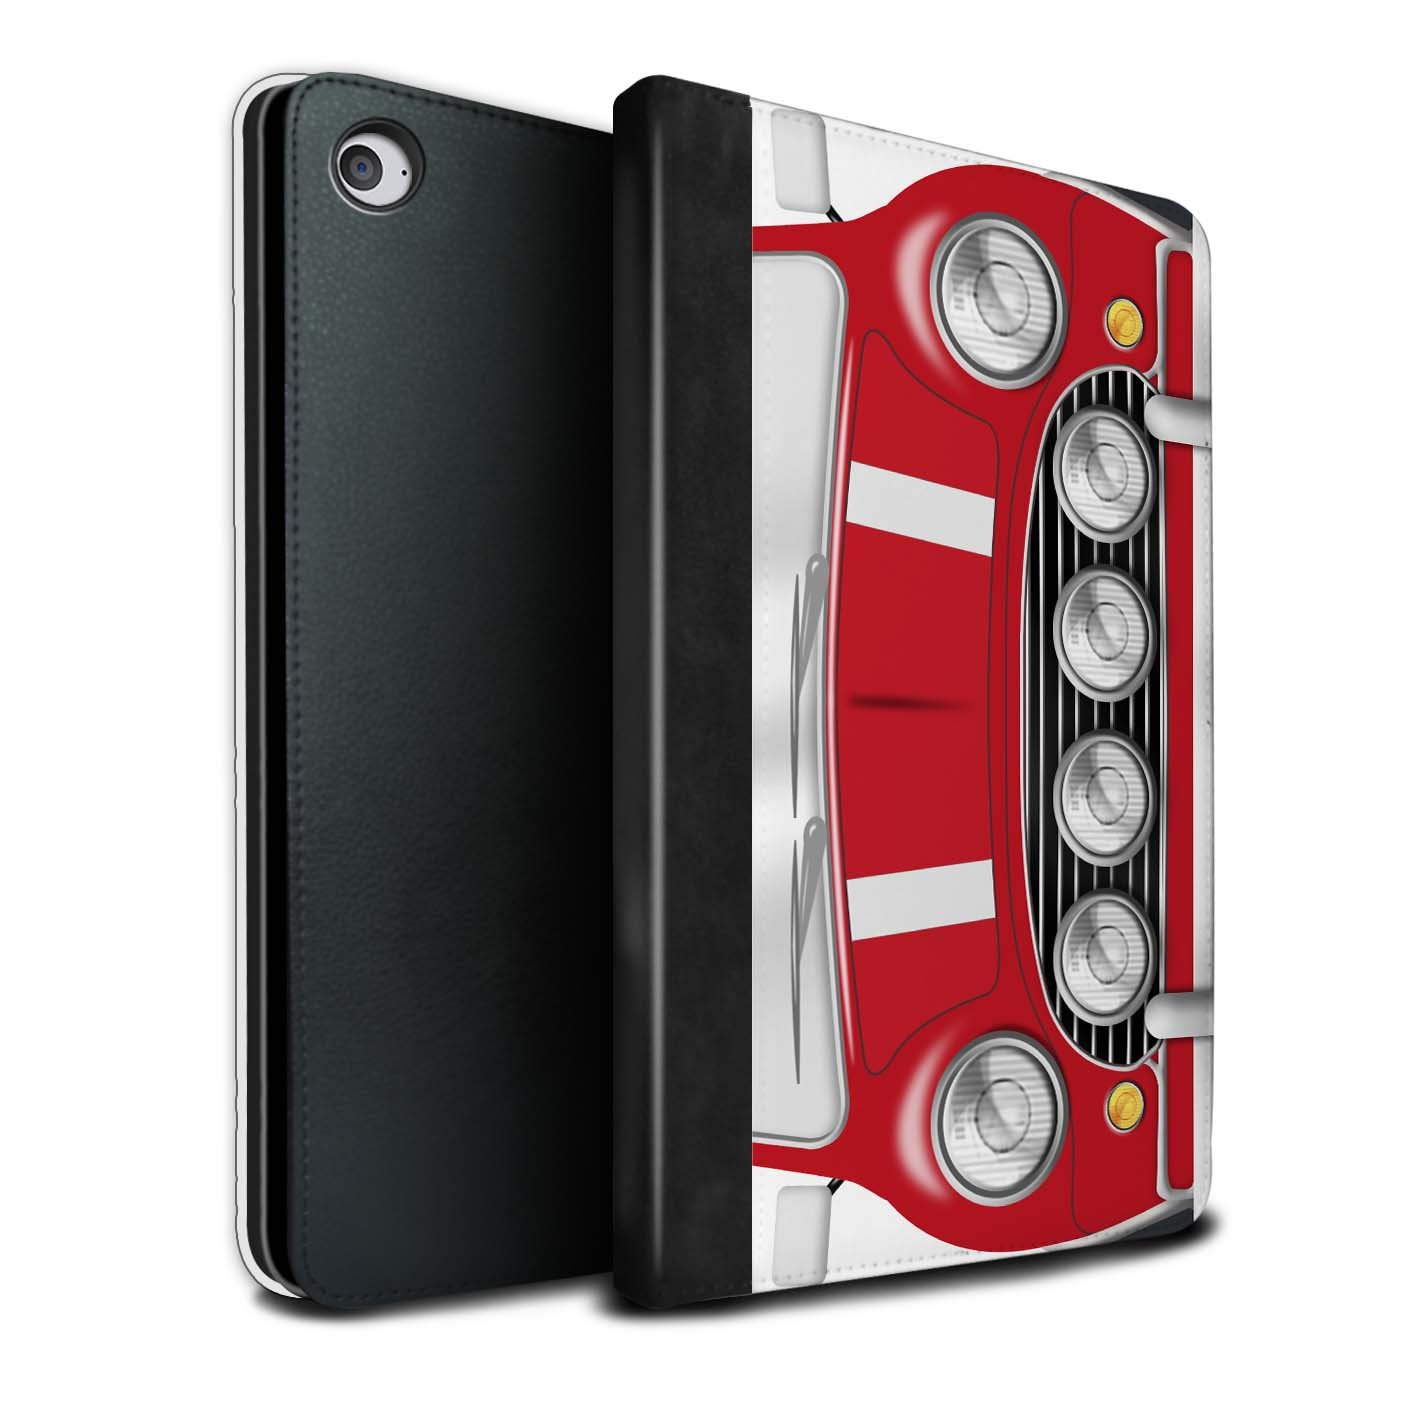 STUFF4 PU Leather Book/Cover Case for Apple iPad Mini 4 tablets / Solar Red Design / Classic Retro Mini Collection